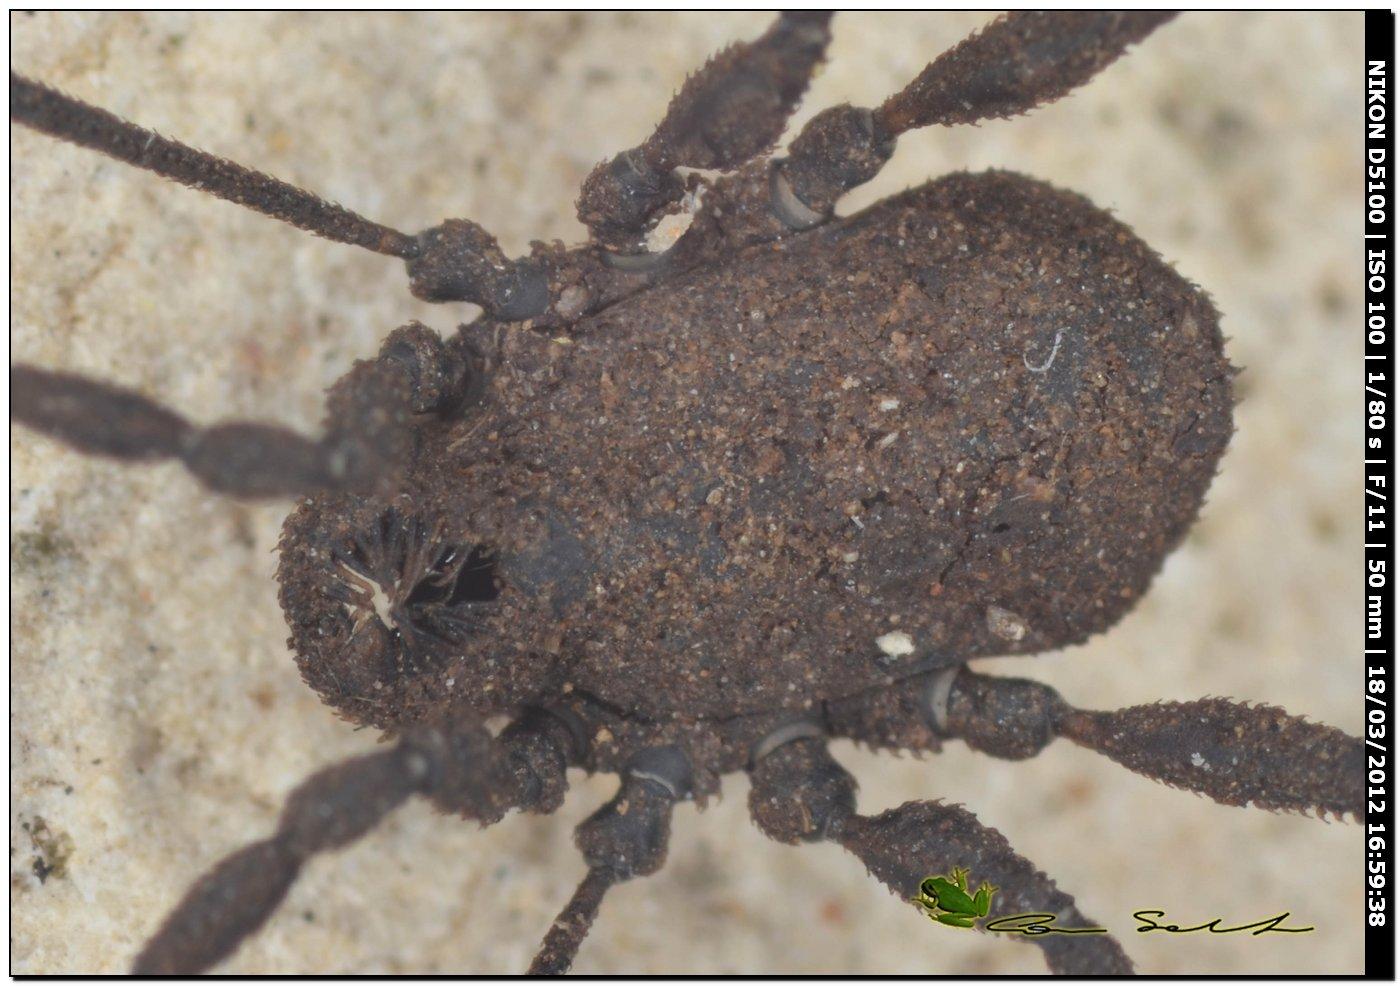 Dicranolasma soerenseni da Bessude No 60 con biotop